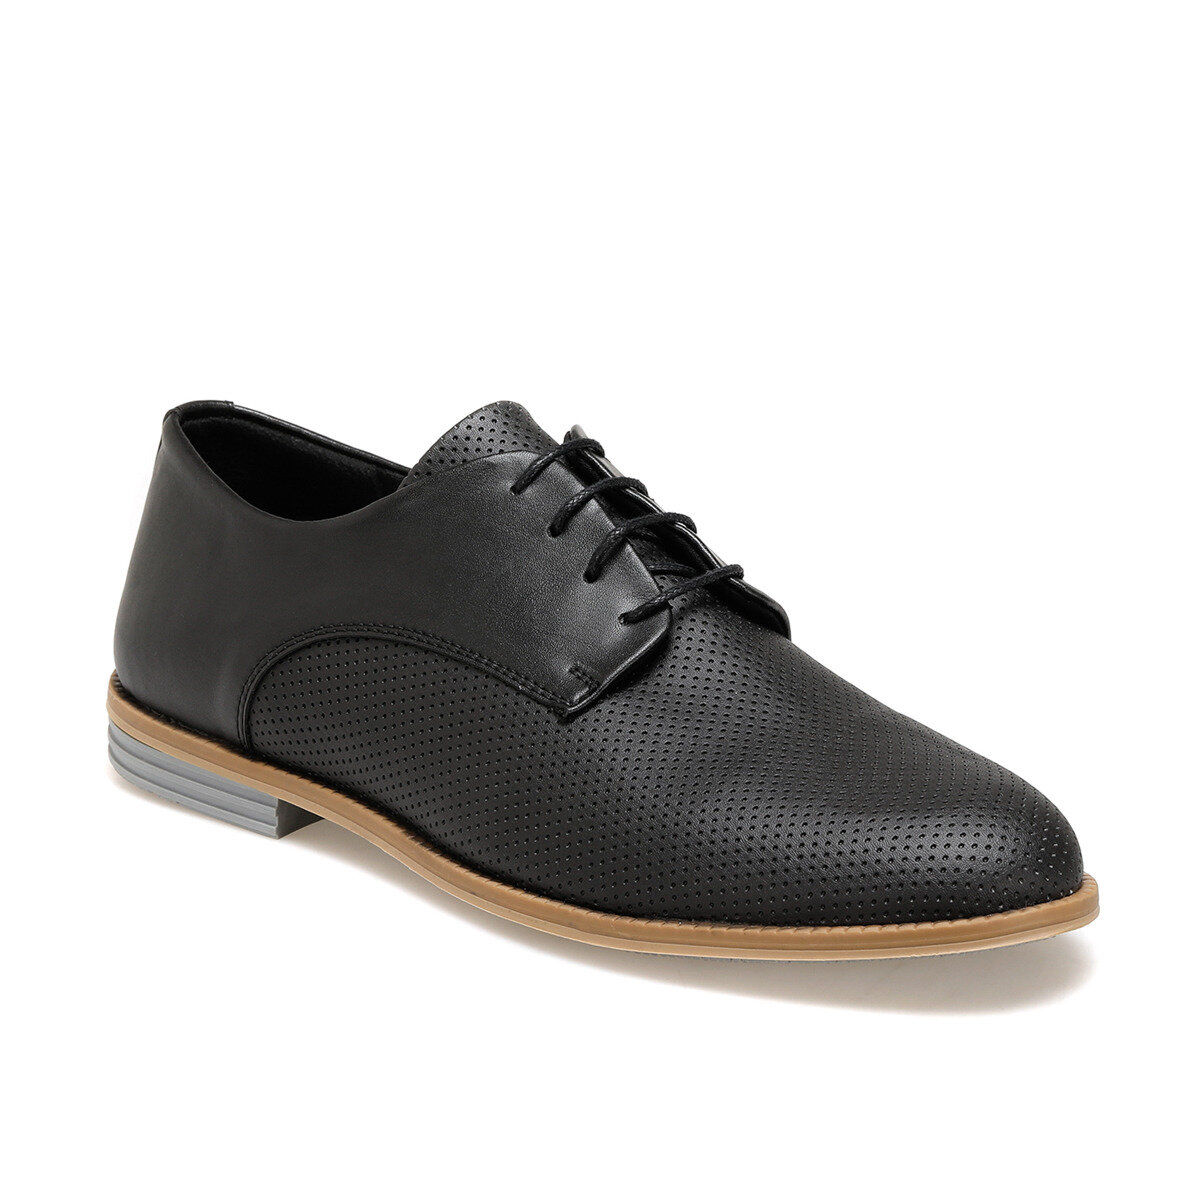 FLO 851-2 Black Men Dress Shoes-Styles